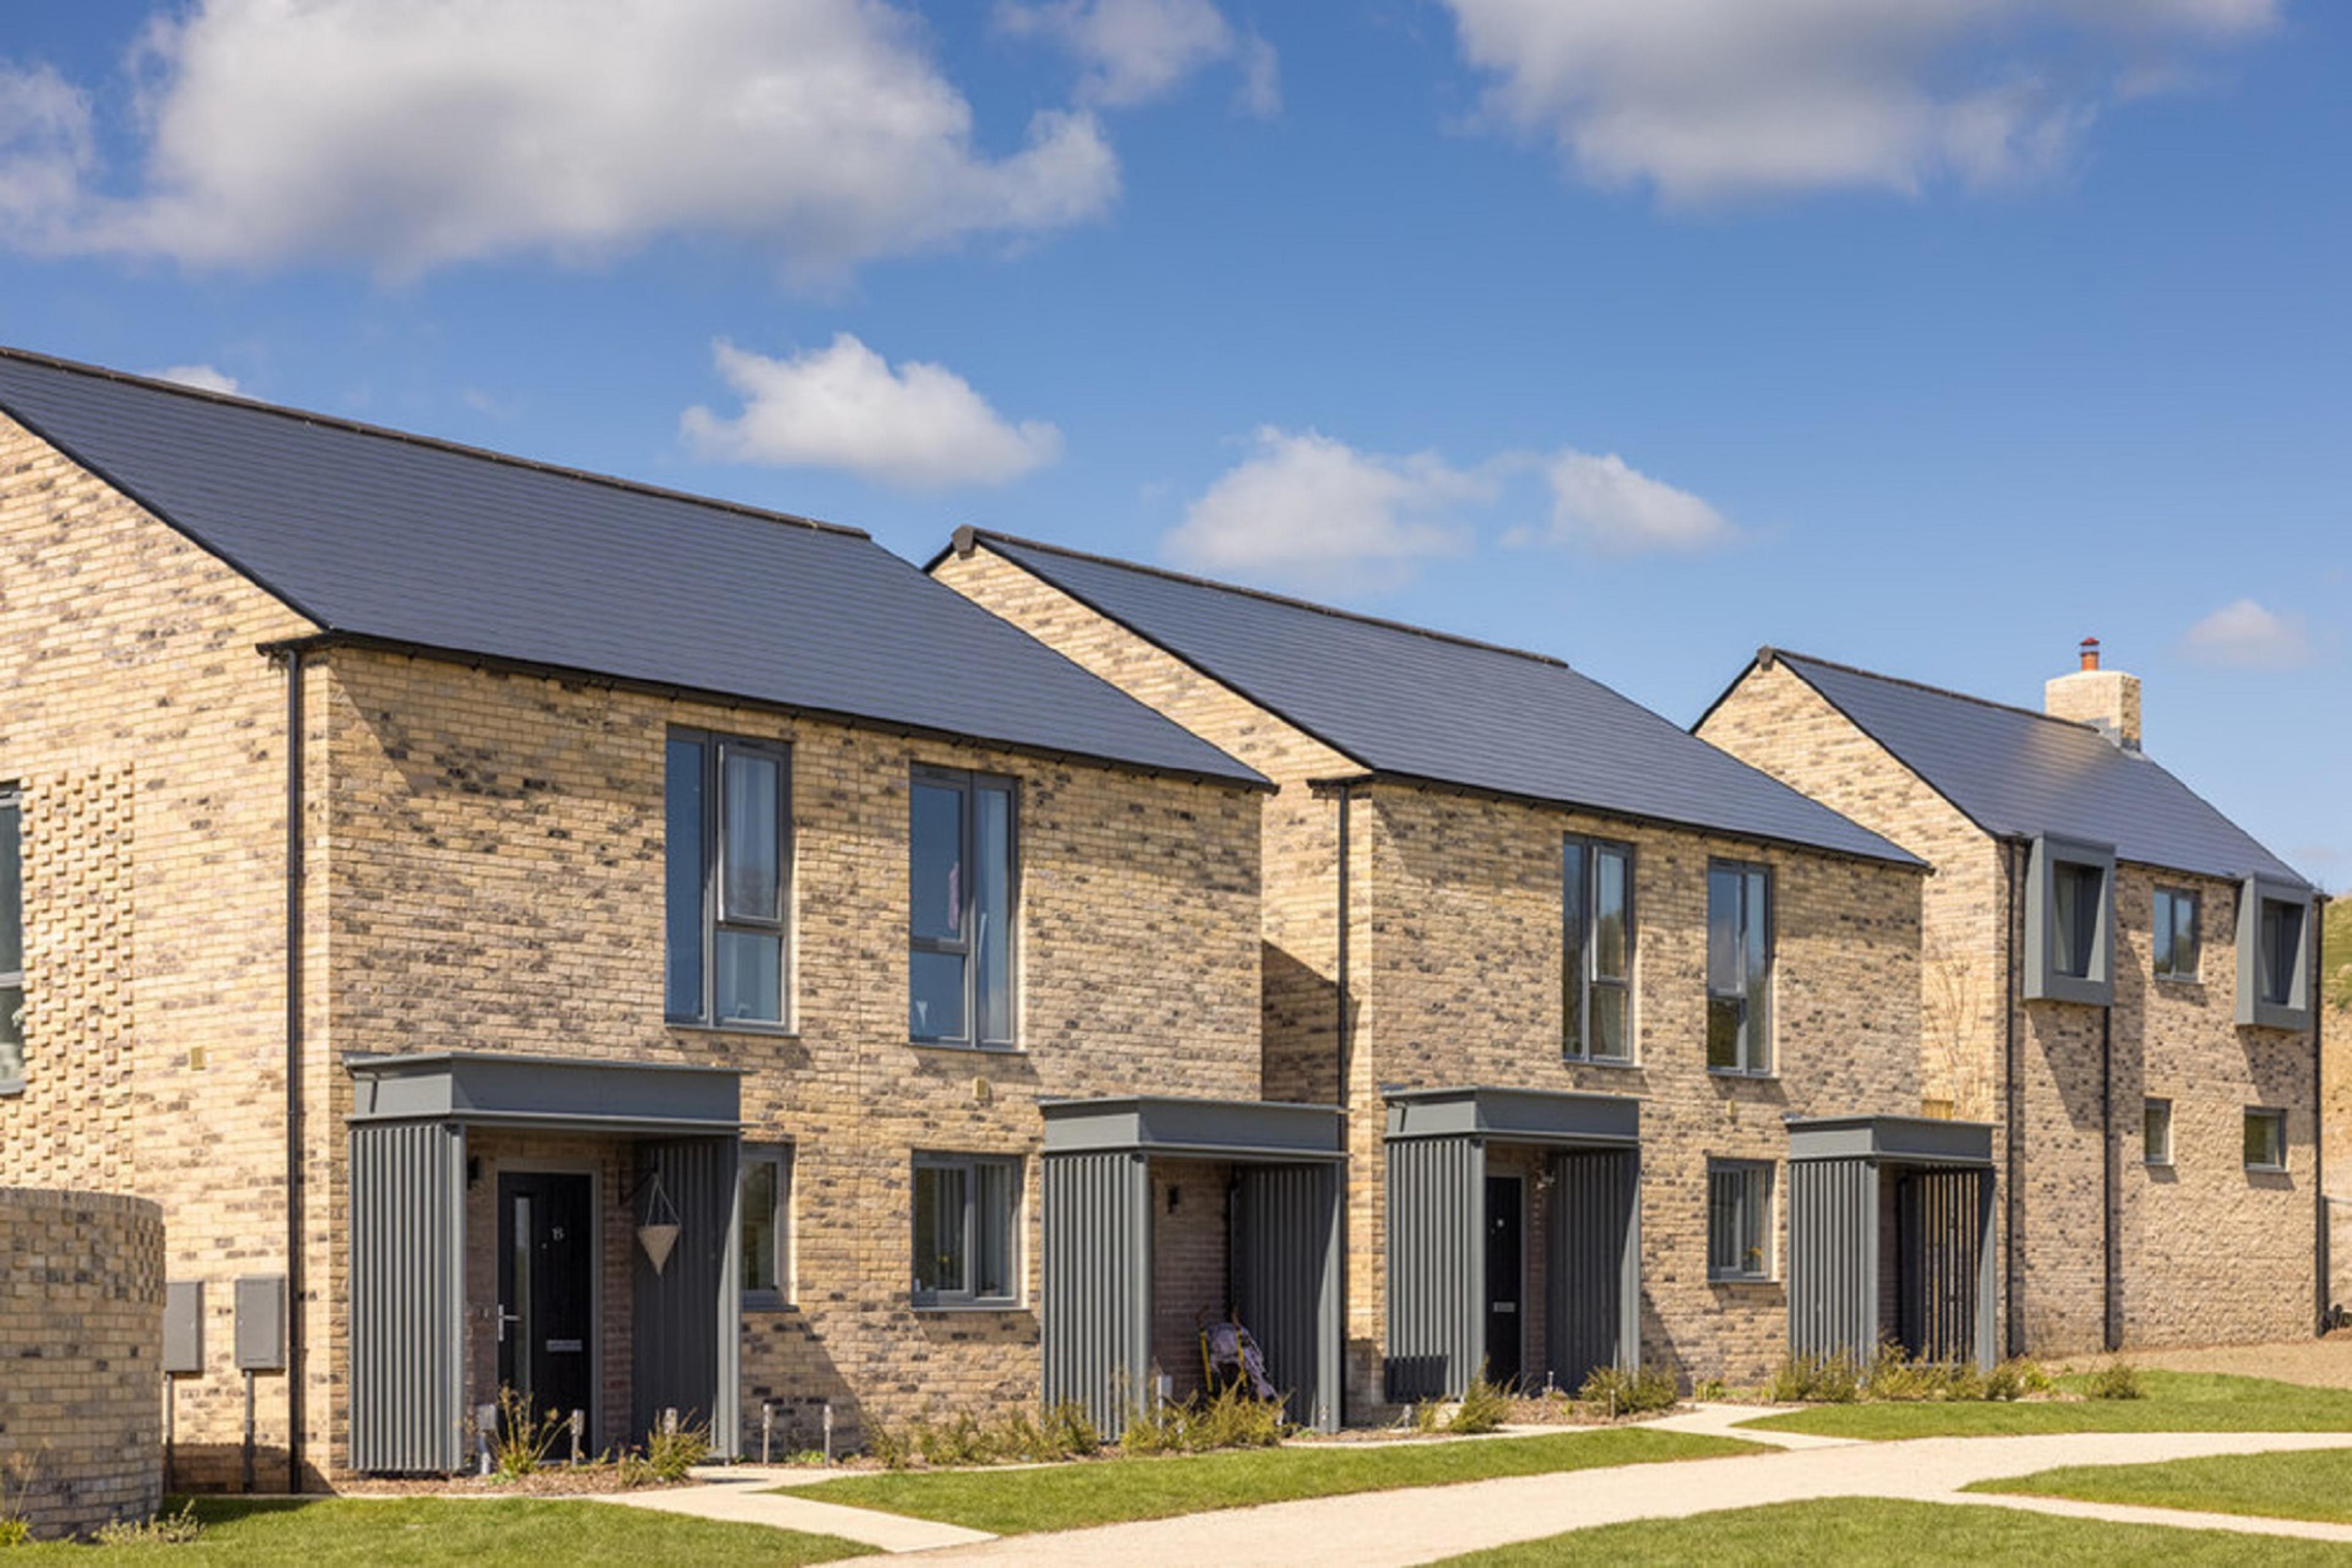 Watling-Grange-Harrogate-new-build-homes-development-street